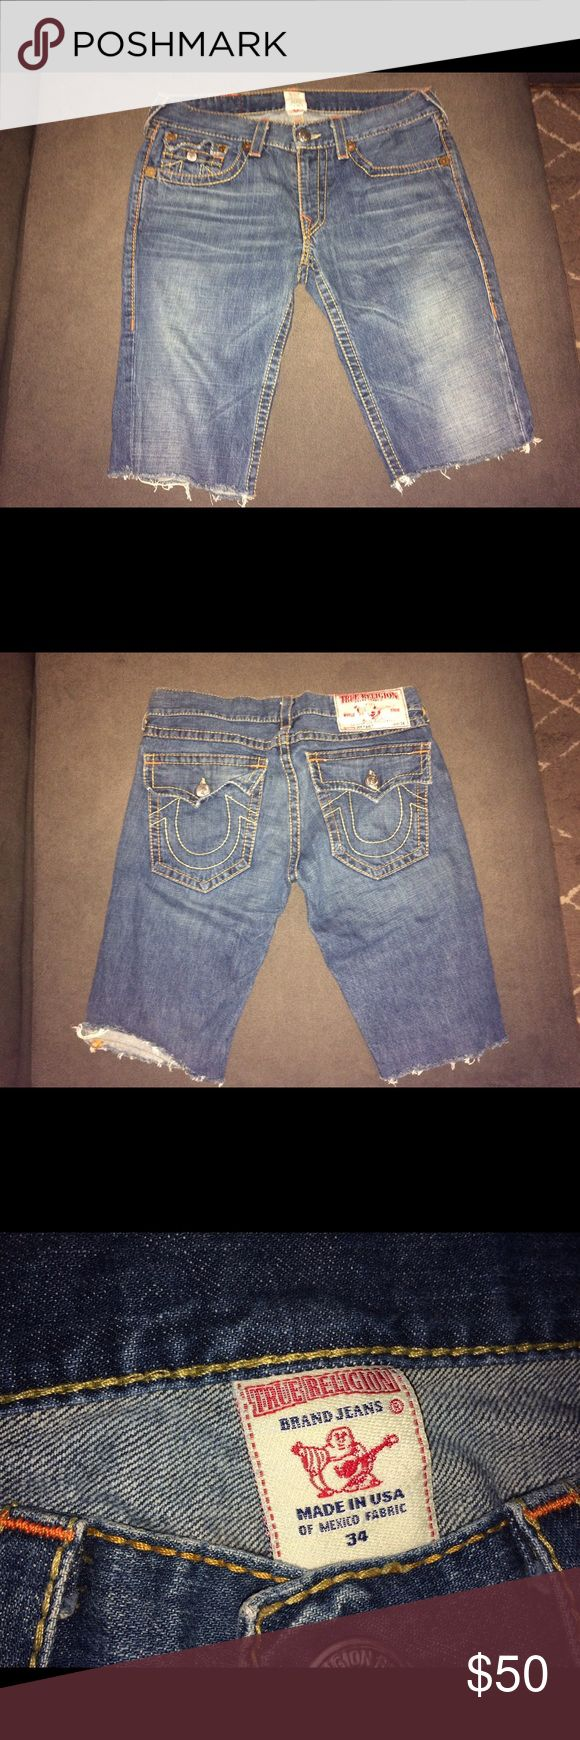 True religion men's Jean shorts True religion jeans that were cut into shorts . Great condition True Religion Shorts Jean Shorts